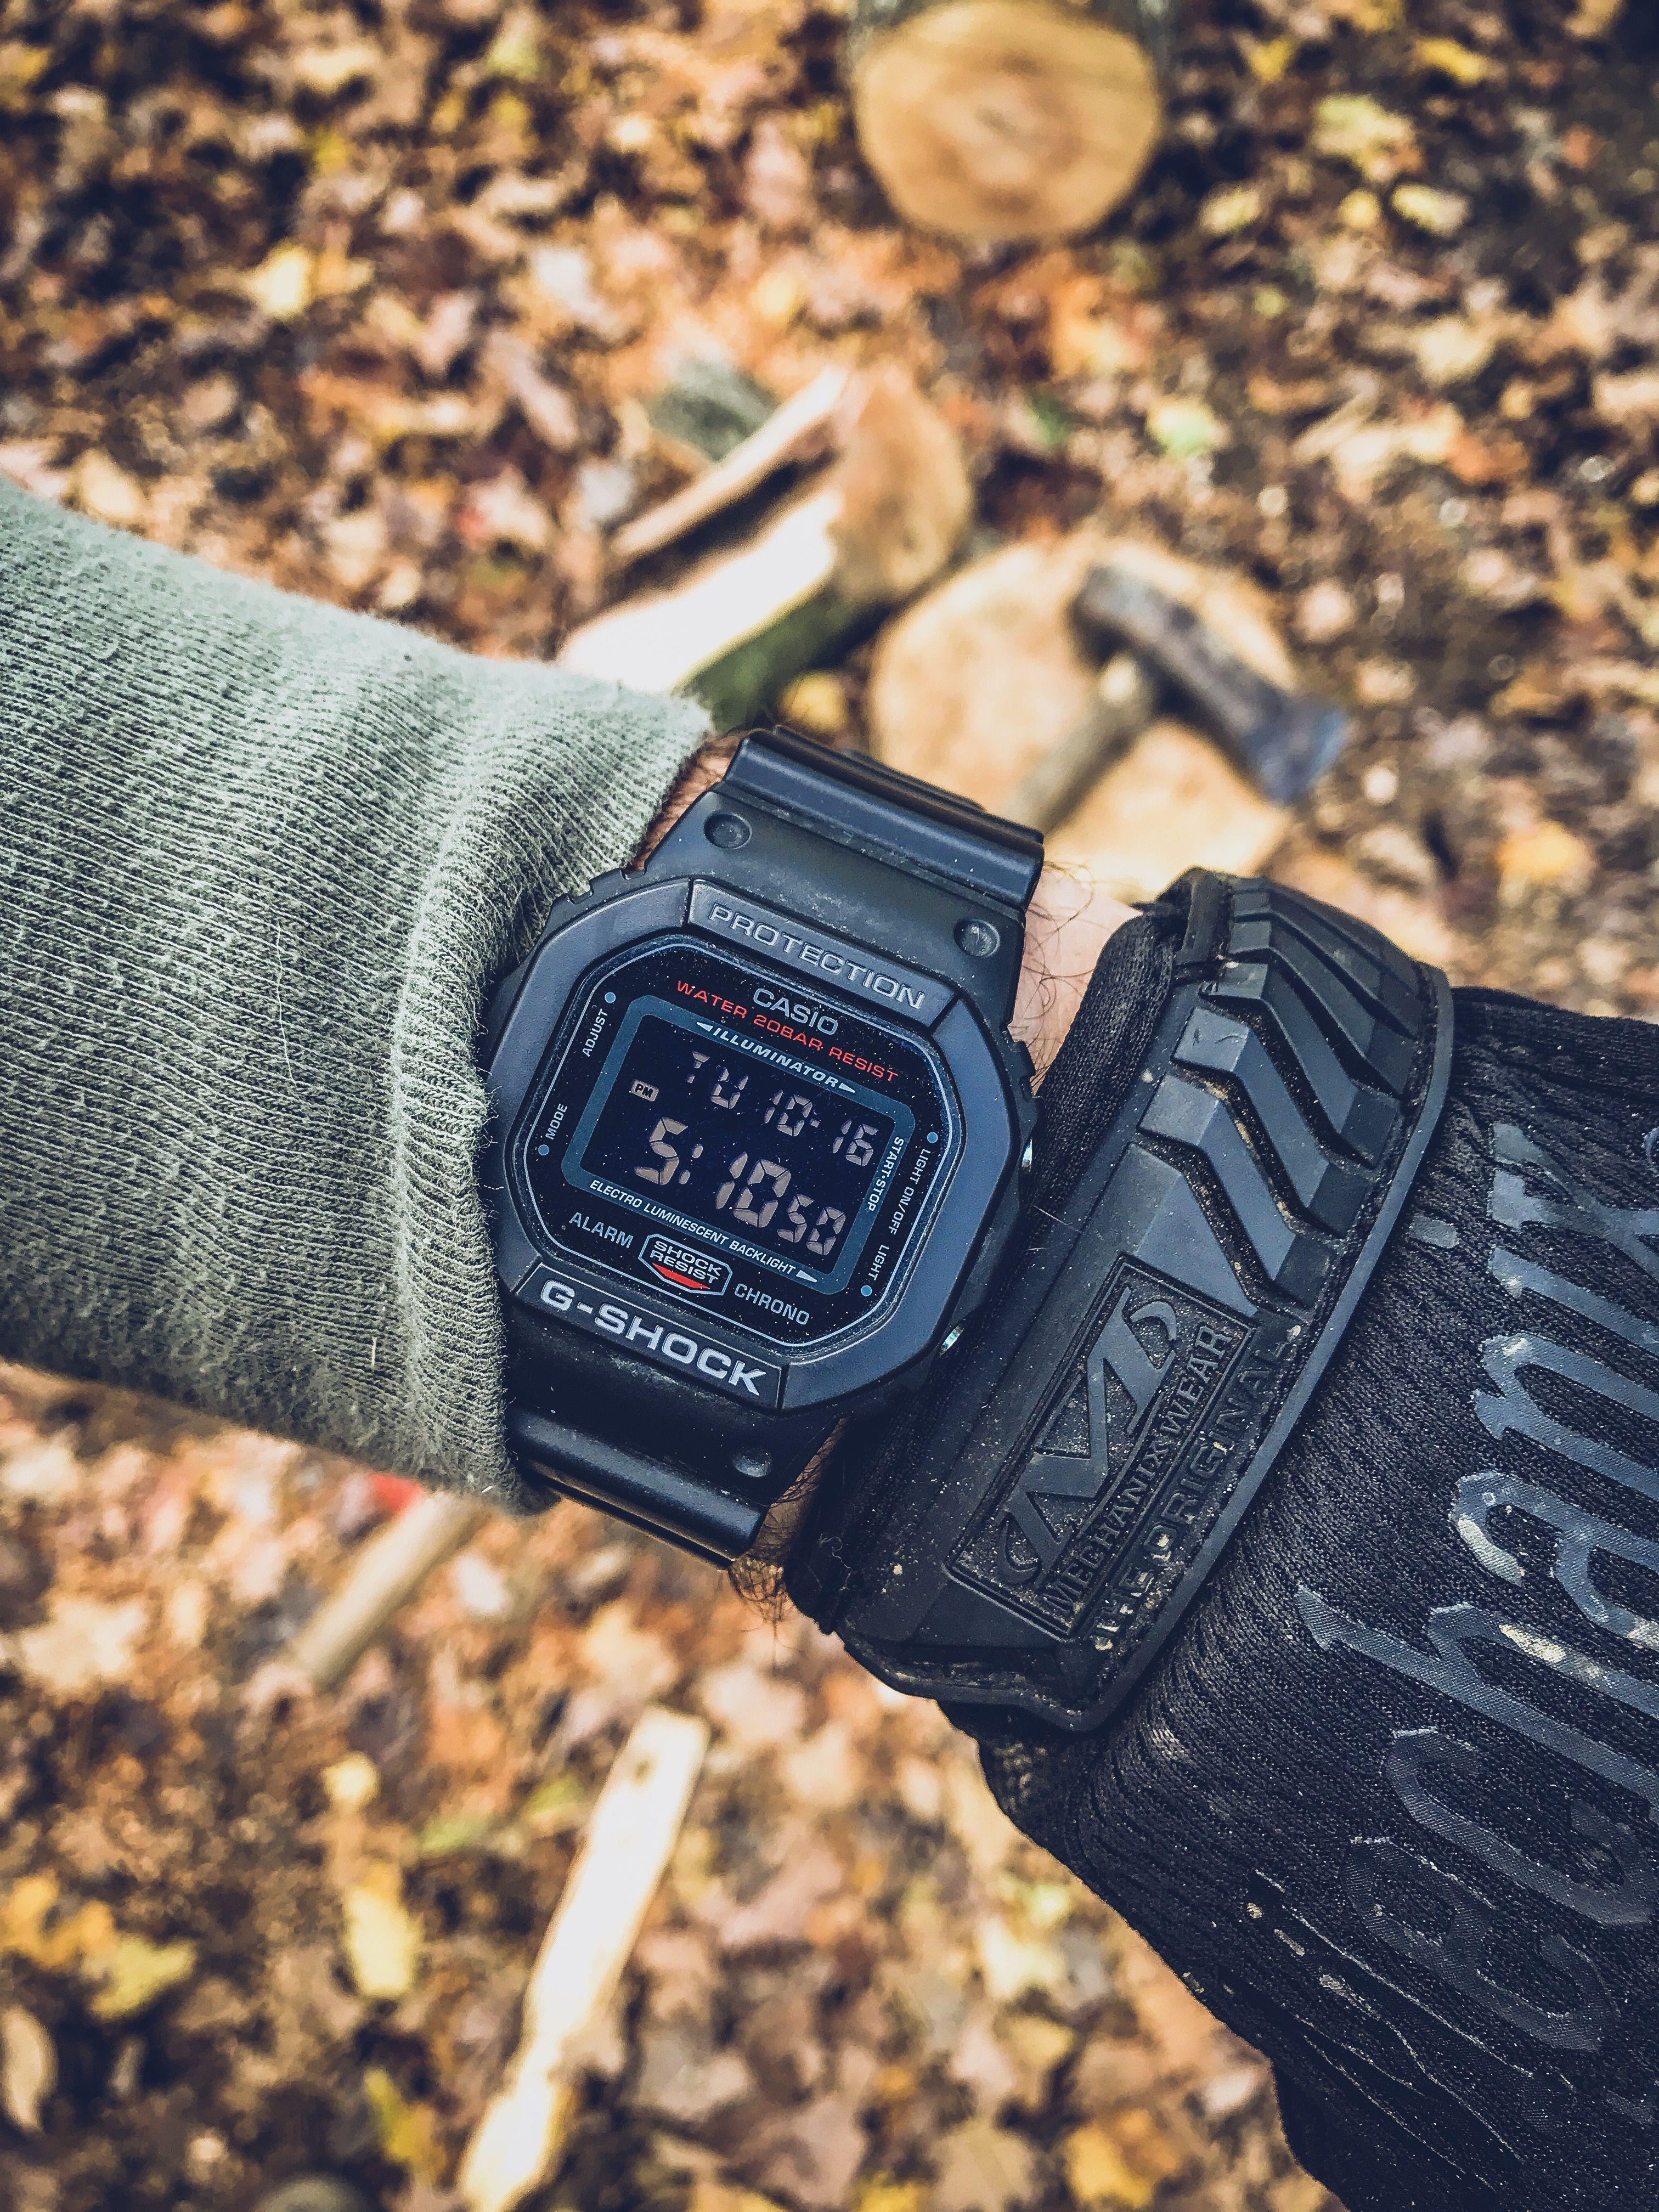 65e0fc1f10b14 Casio G Shock DW-5600HR-1 Blacked out G Shock